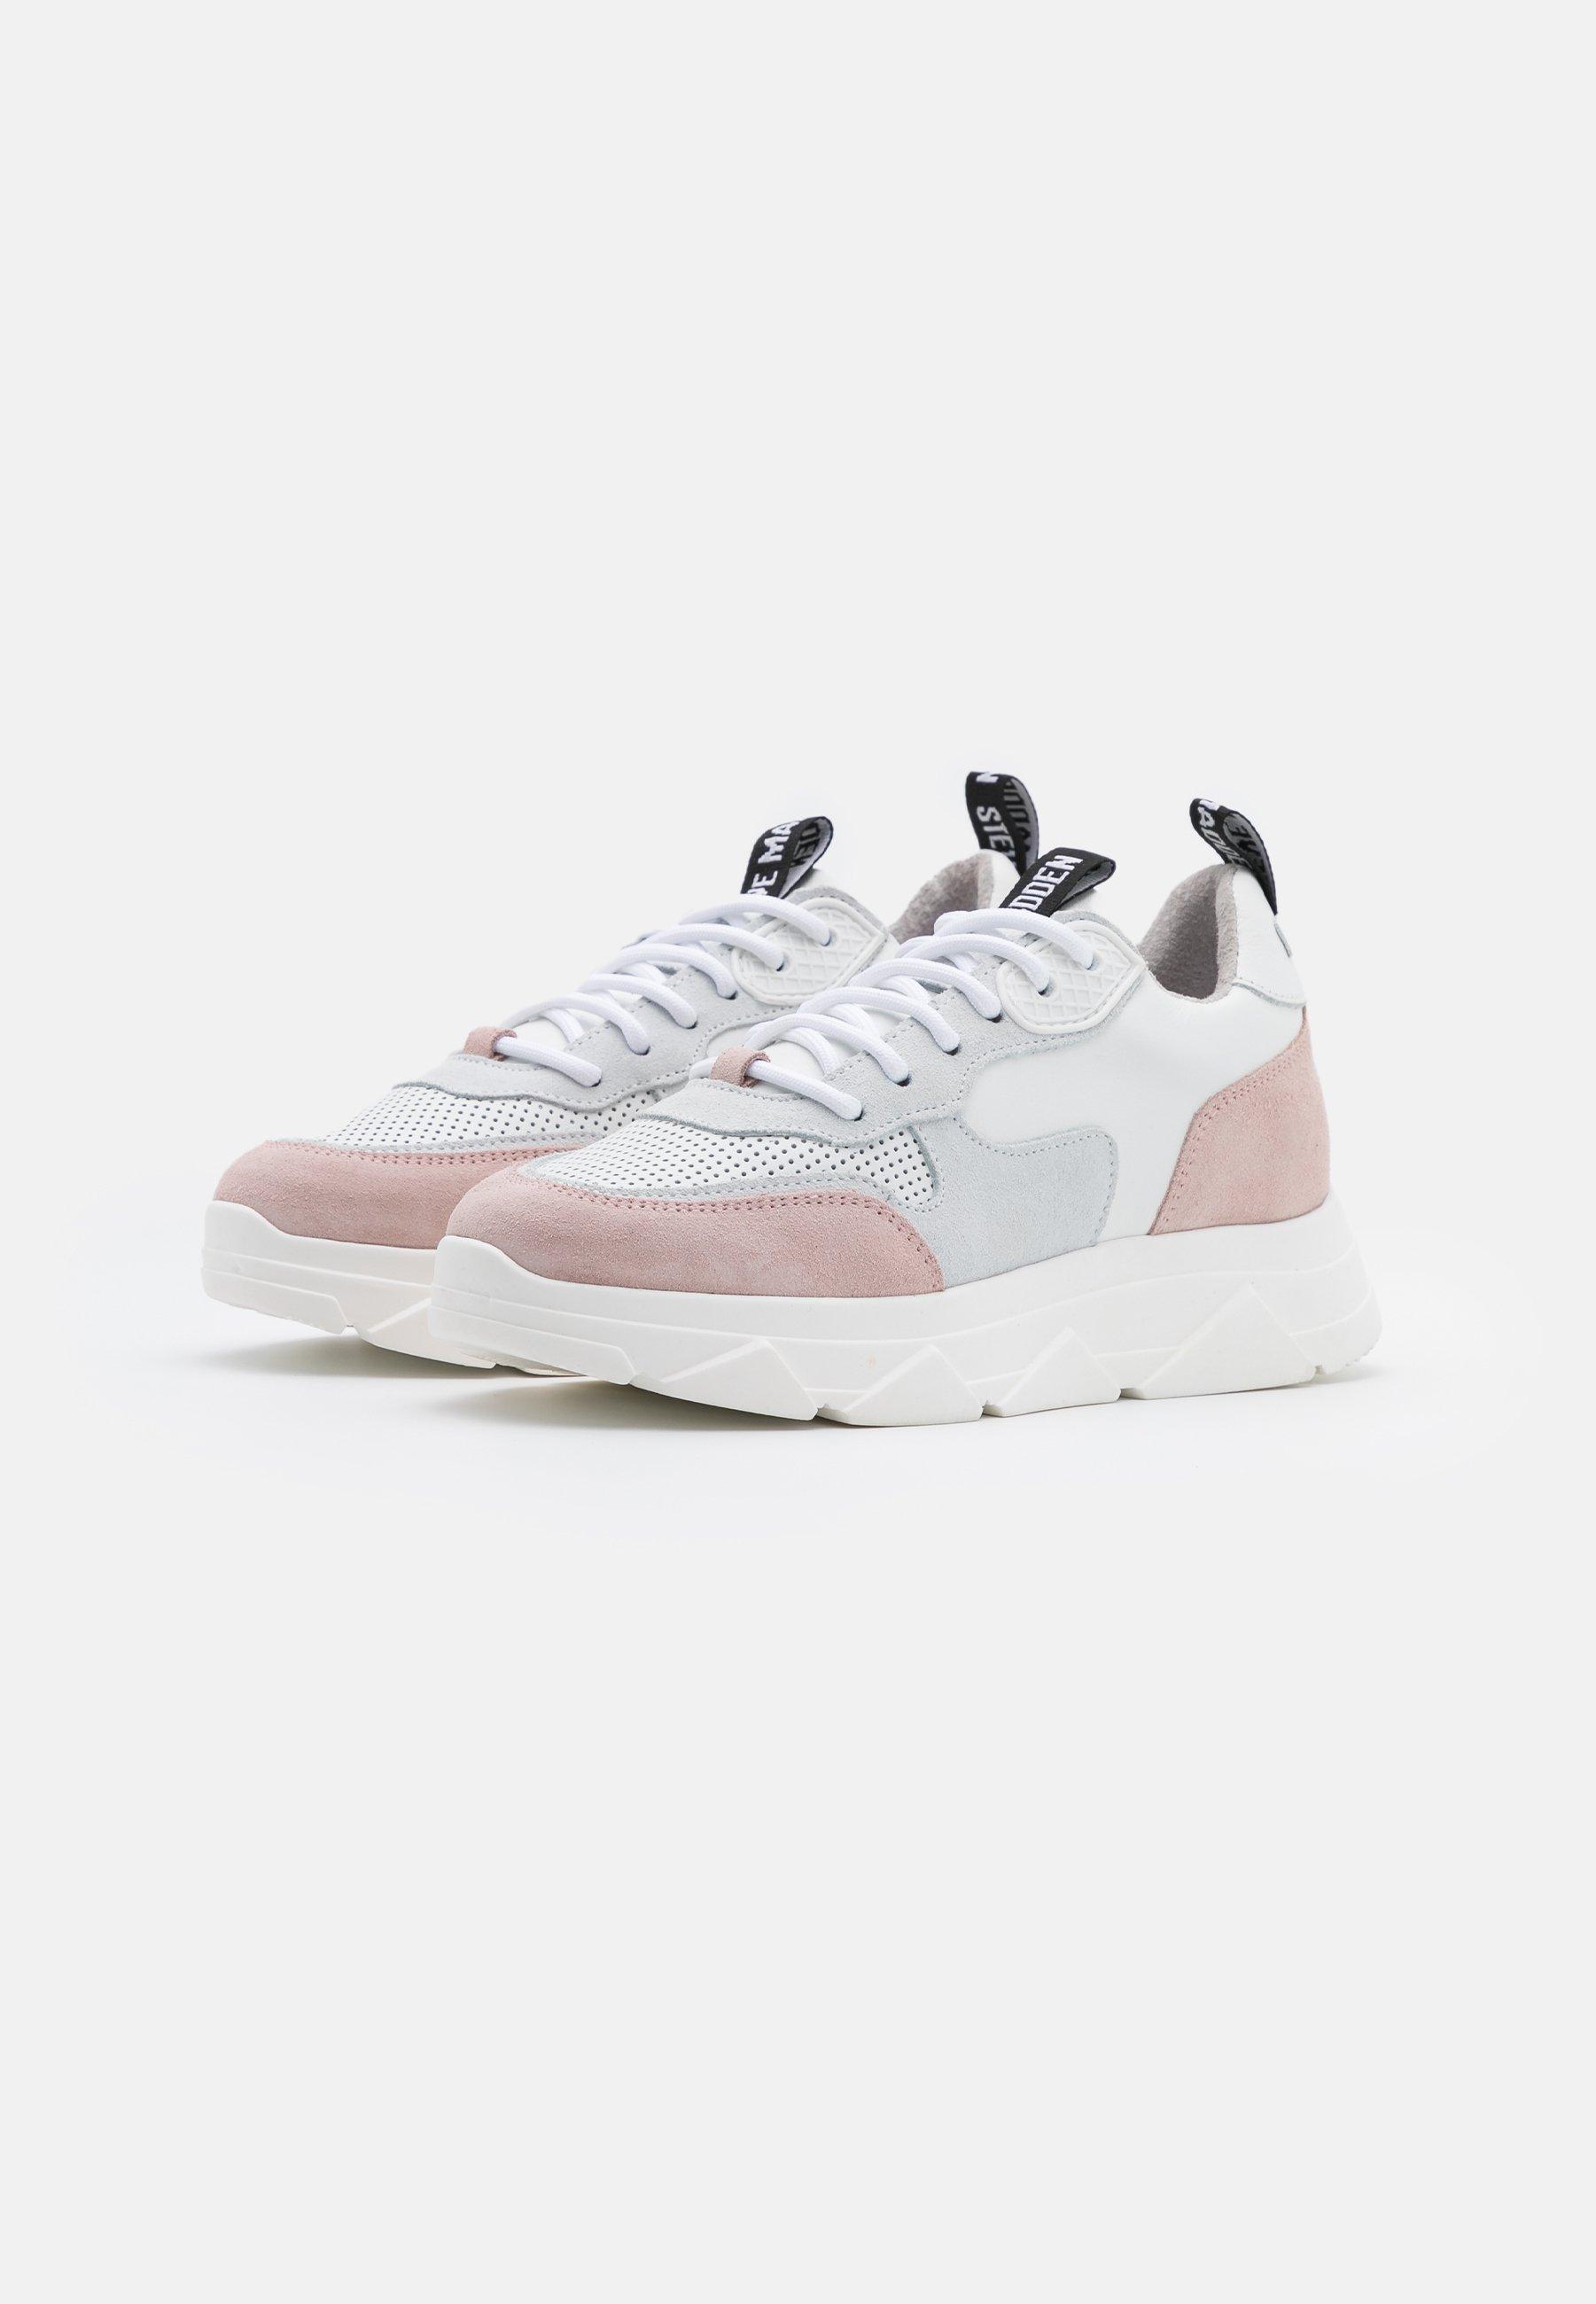 Steve Madden PITTY Sneaker low white/pink/weiß